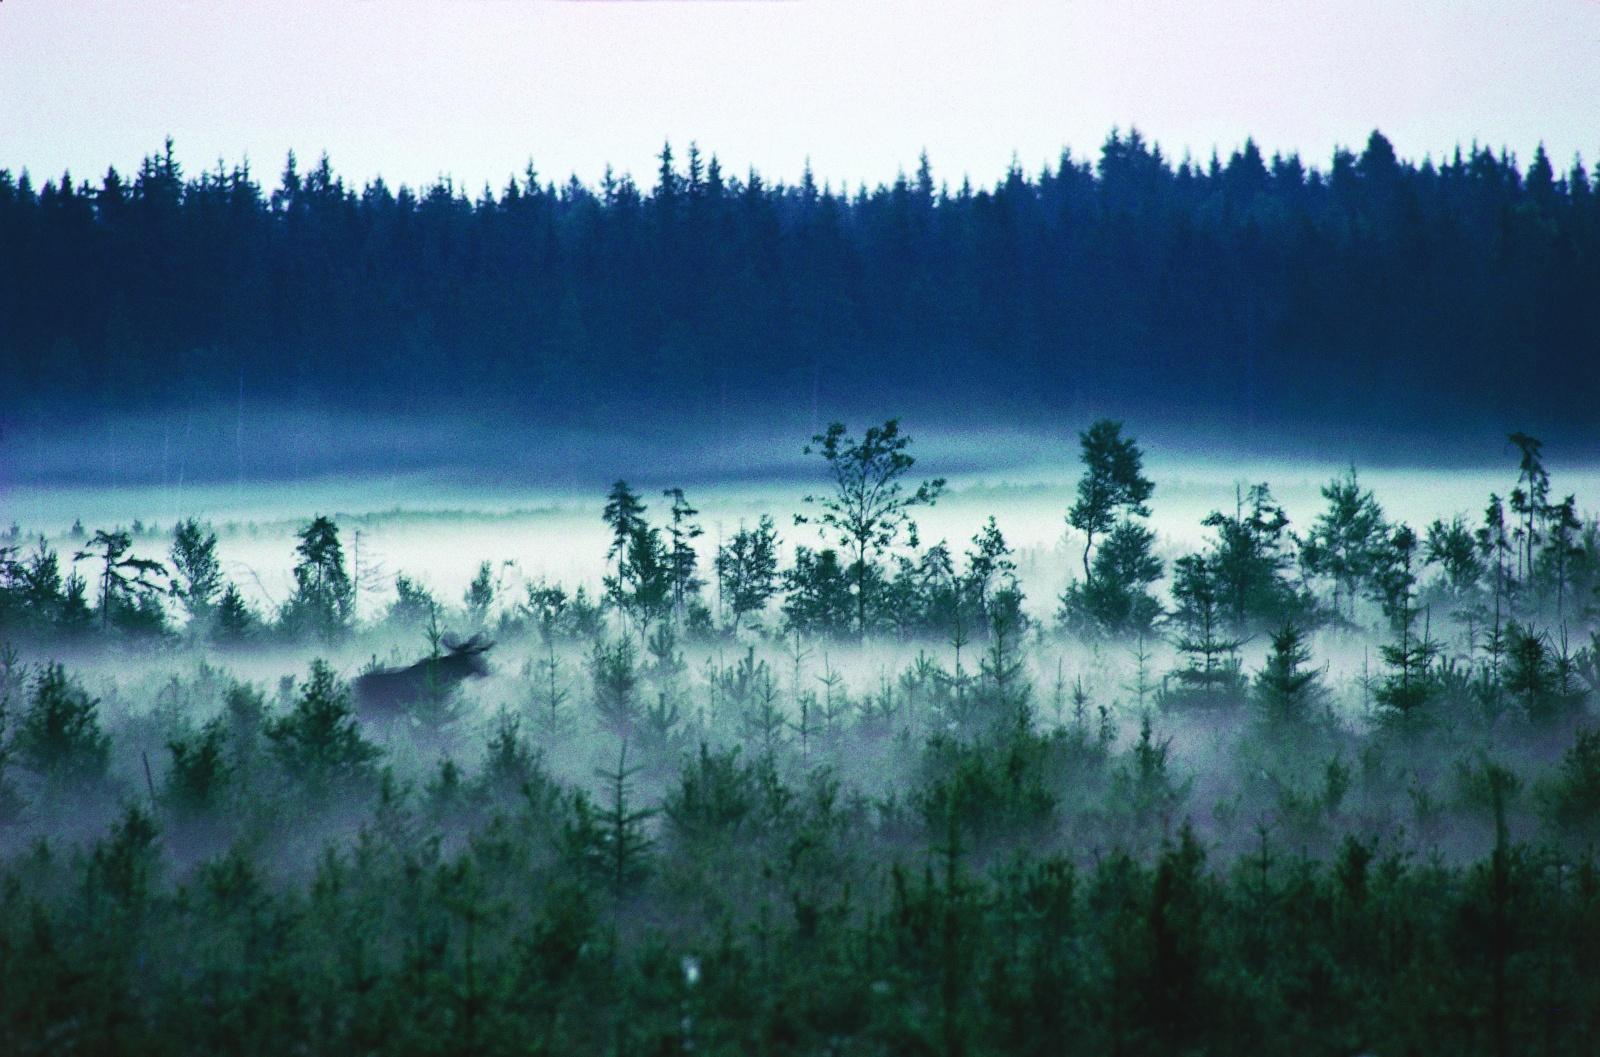 Photo: Lars Gabrielsson. Moose running in the mist